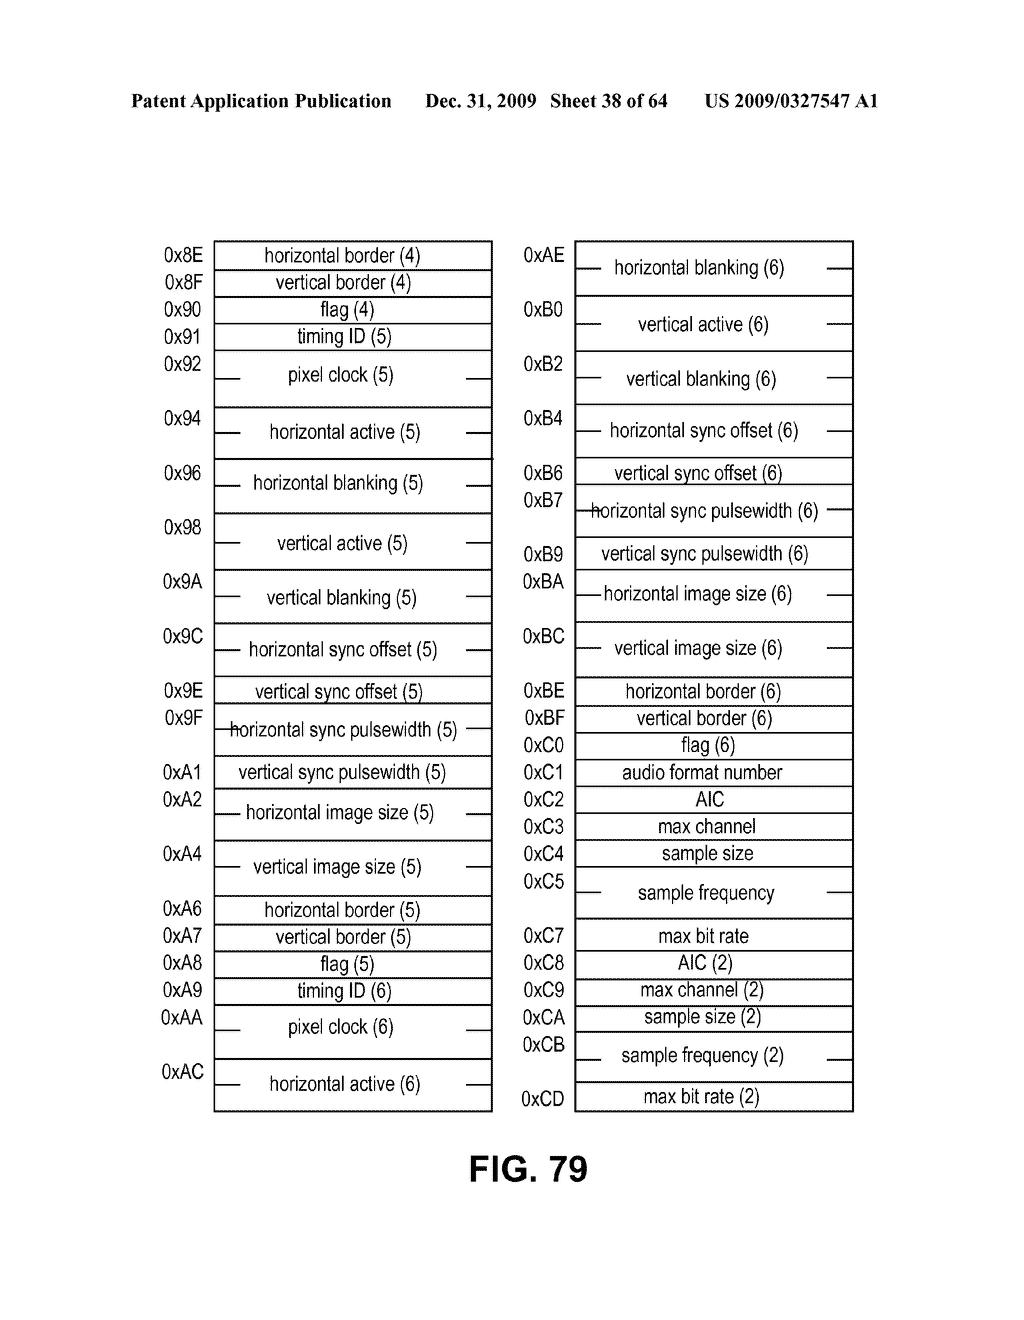 i2c bus compatible with hdmi diagram, schematic, and image 39 HDMI Schematic Symbol